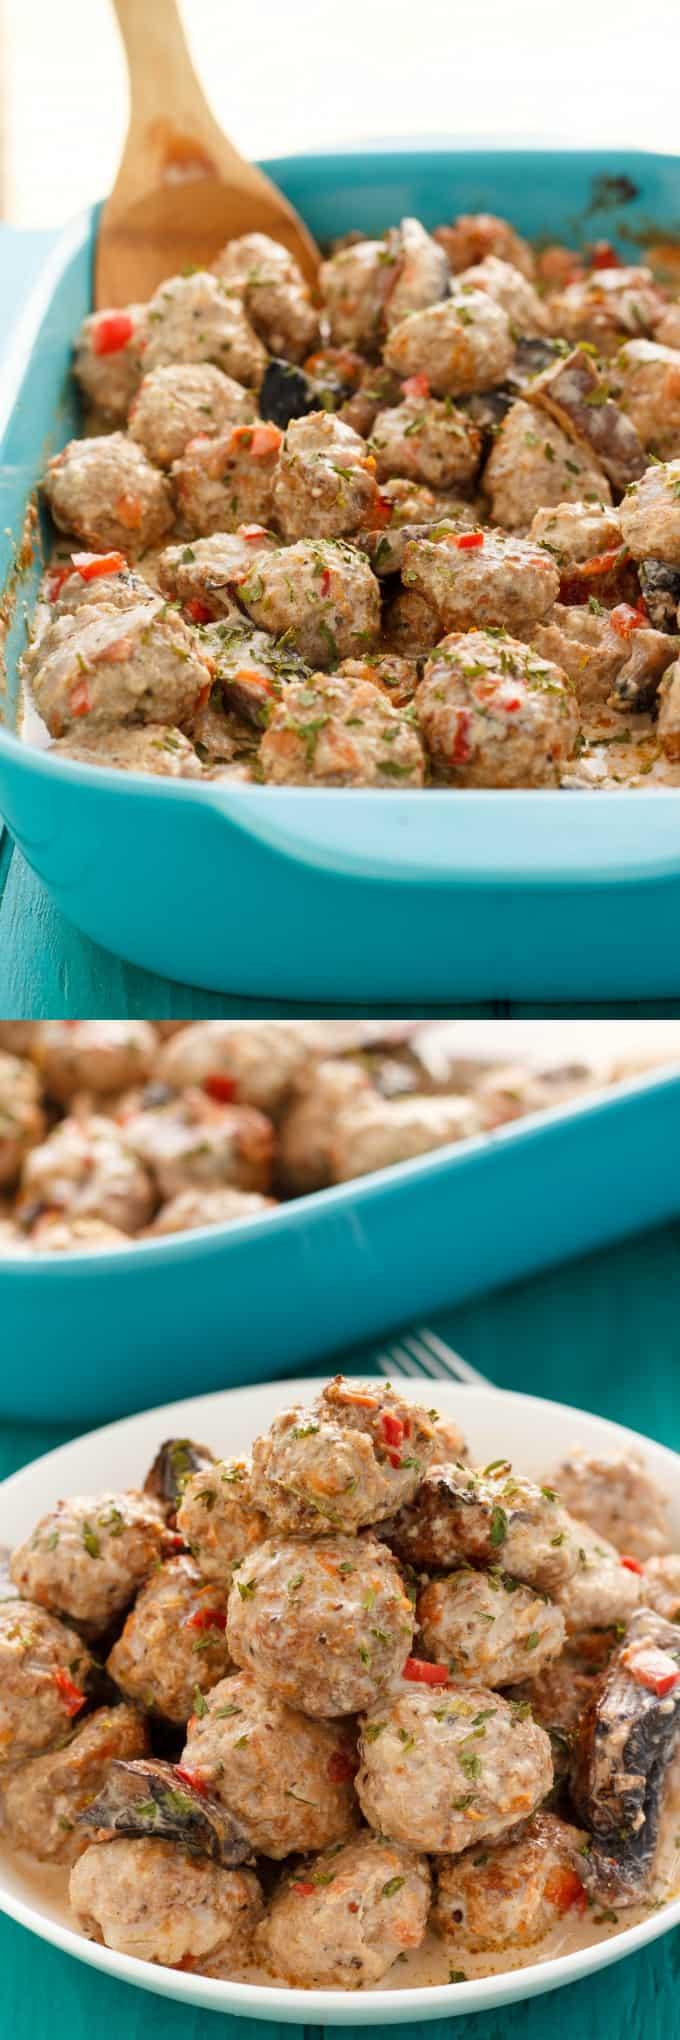 Turkey Meatballs in a Creamy Portobello Mushroom Sauce #turkey